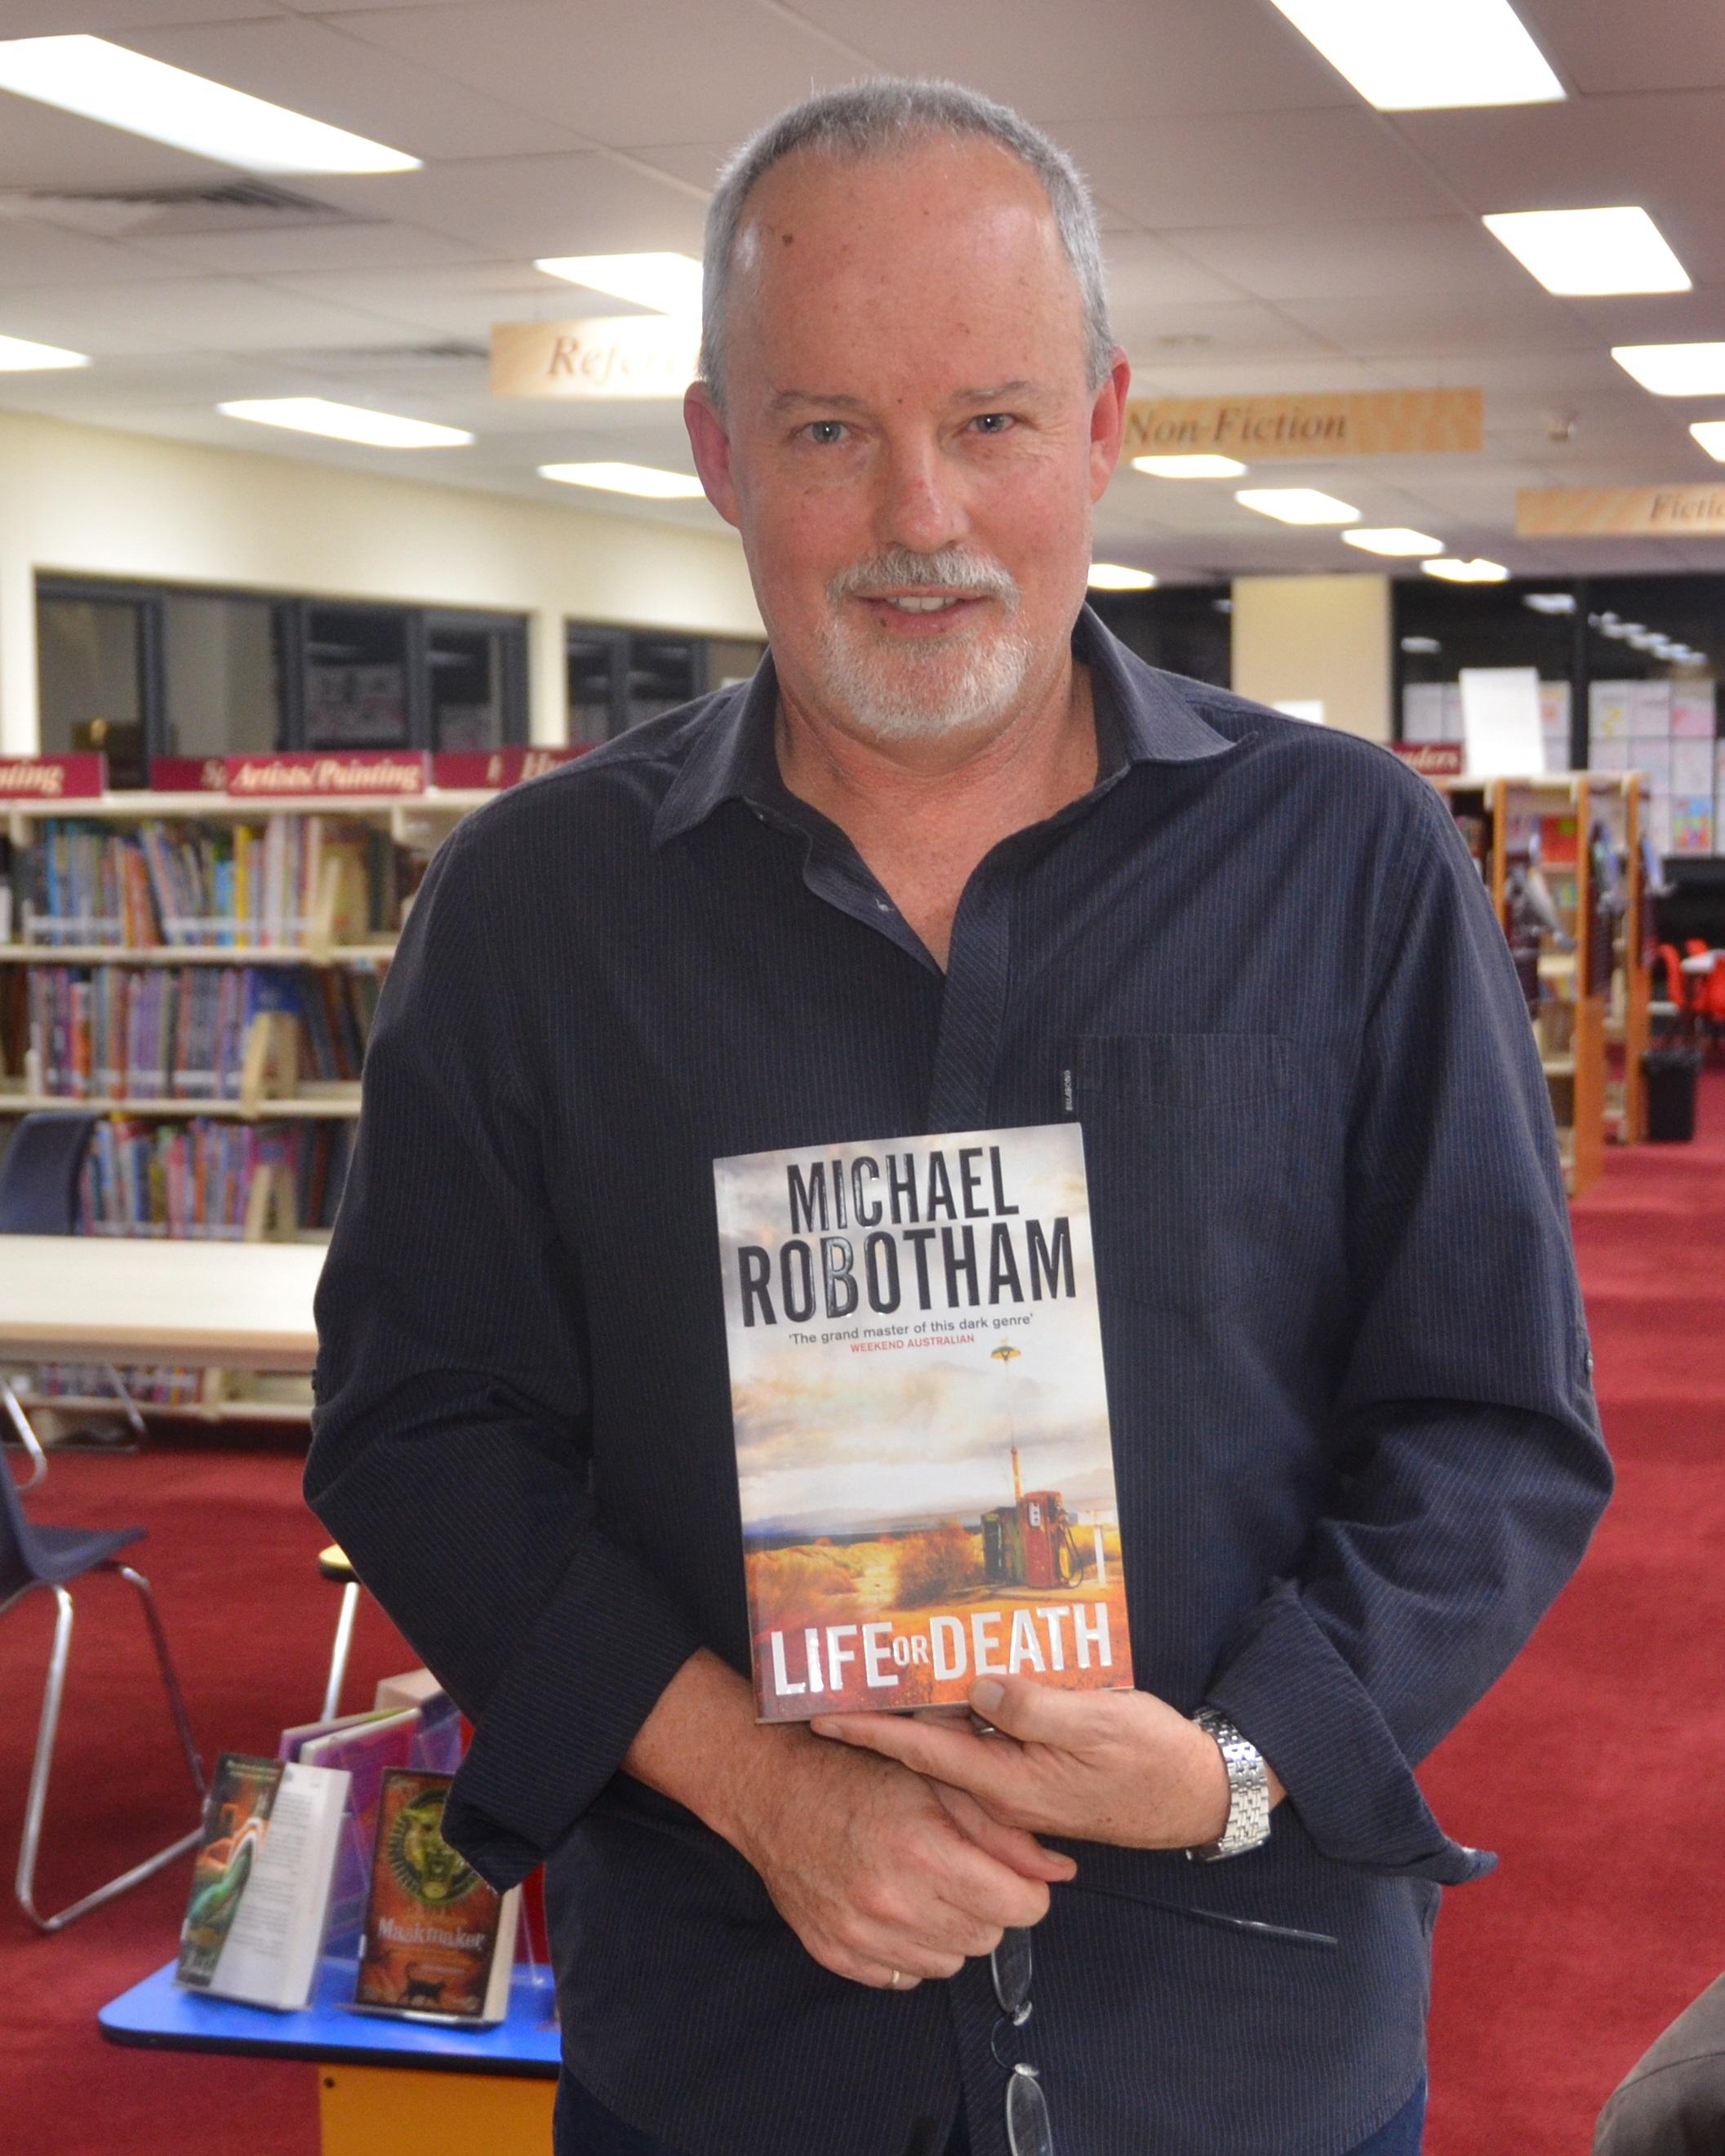 Michael Robotham in 2014 at Mosman Library Service